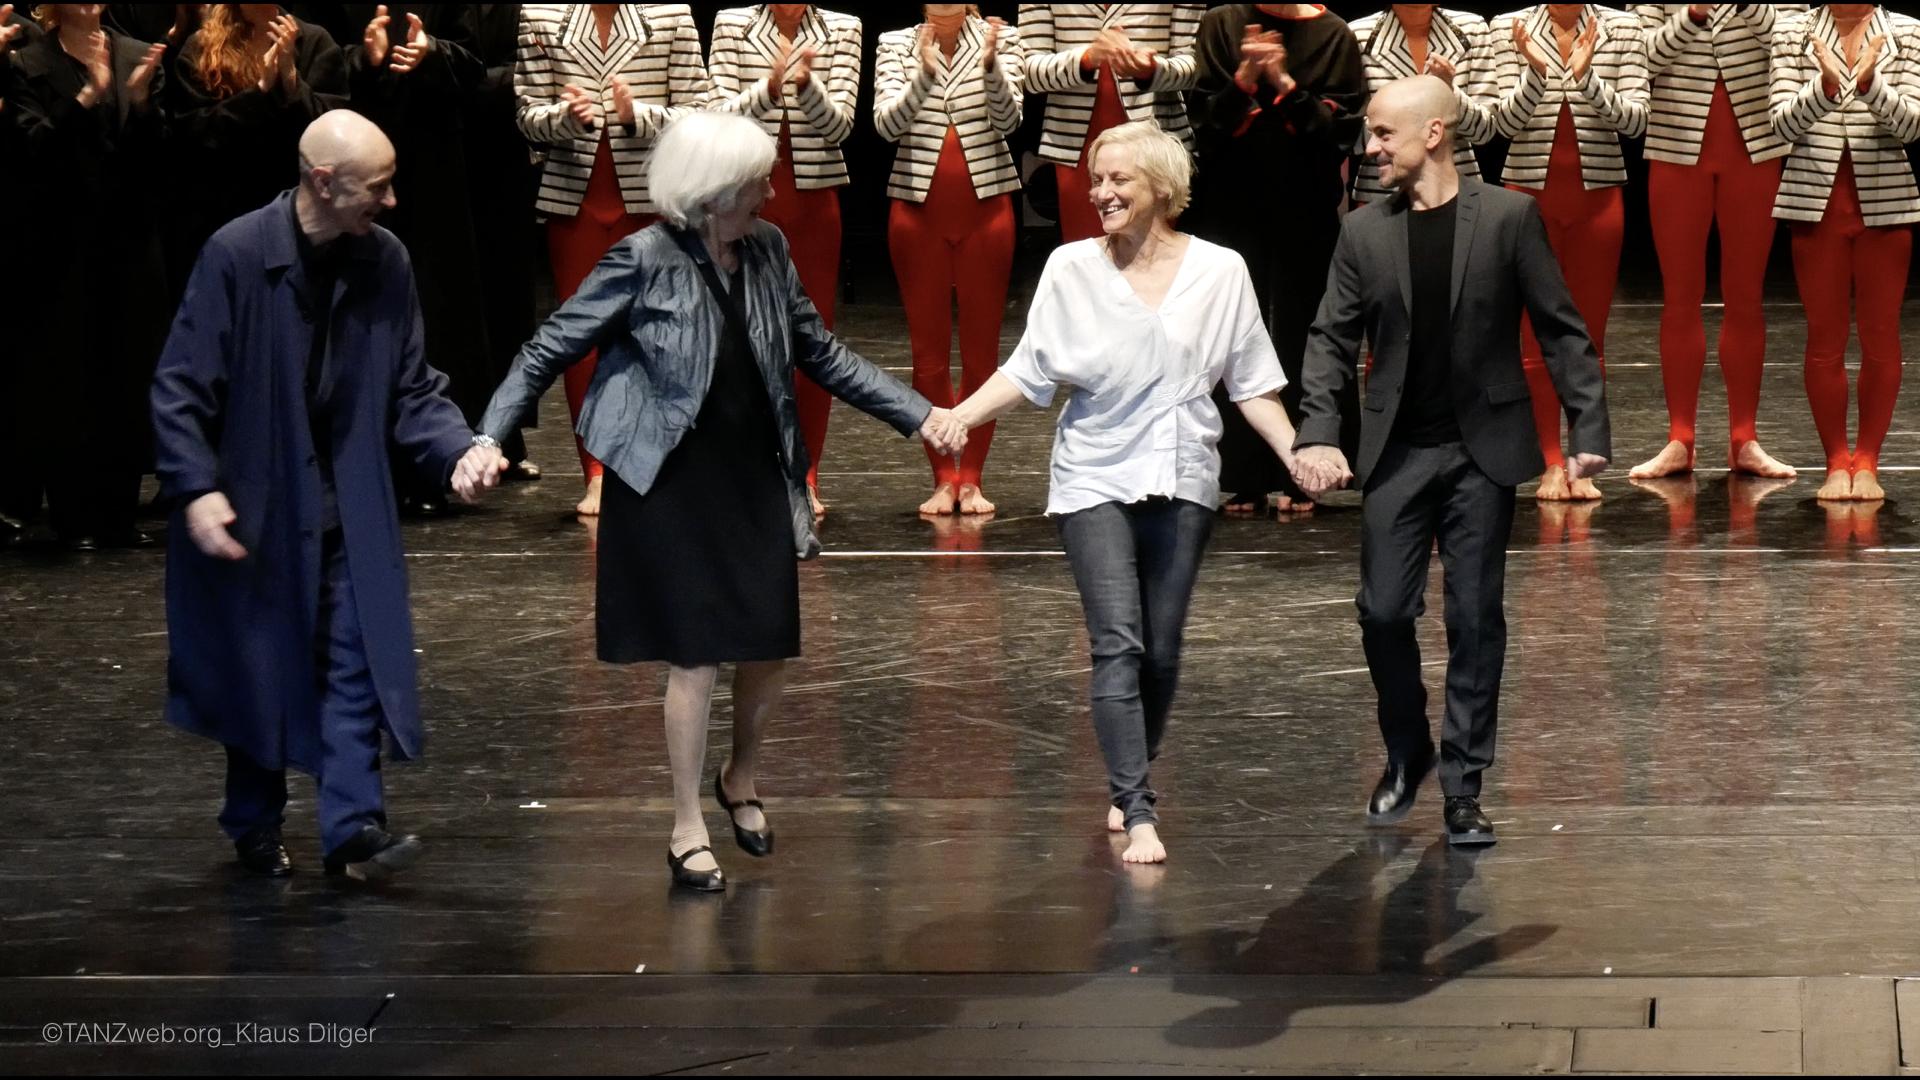 ©PRESSEBILDER Klaus Dilger_TANZWEB Verleihung Deutscher Tanzpreis 2018 in Essen Grand Finale - Cesc Gelabert-Nele Hertling-Meg Stuart-Goyo Montero